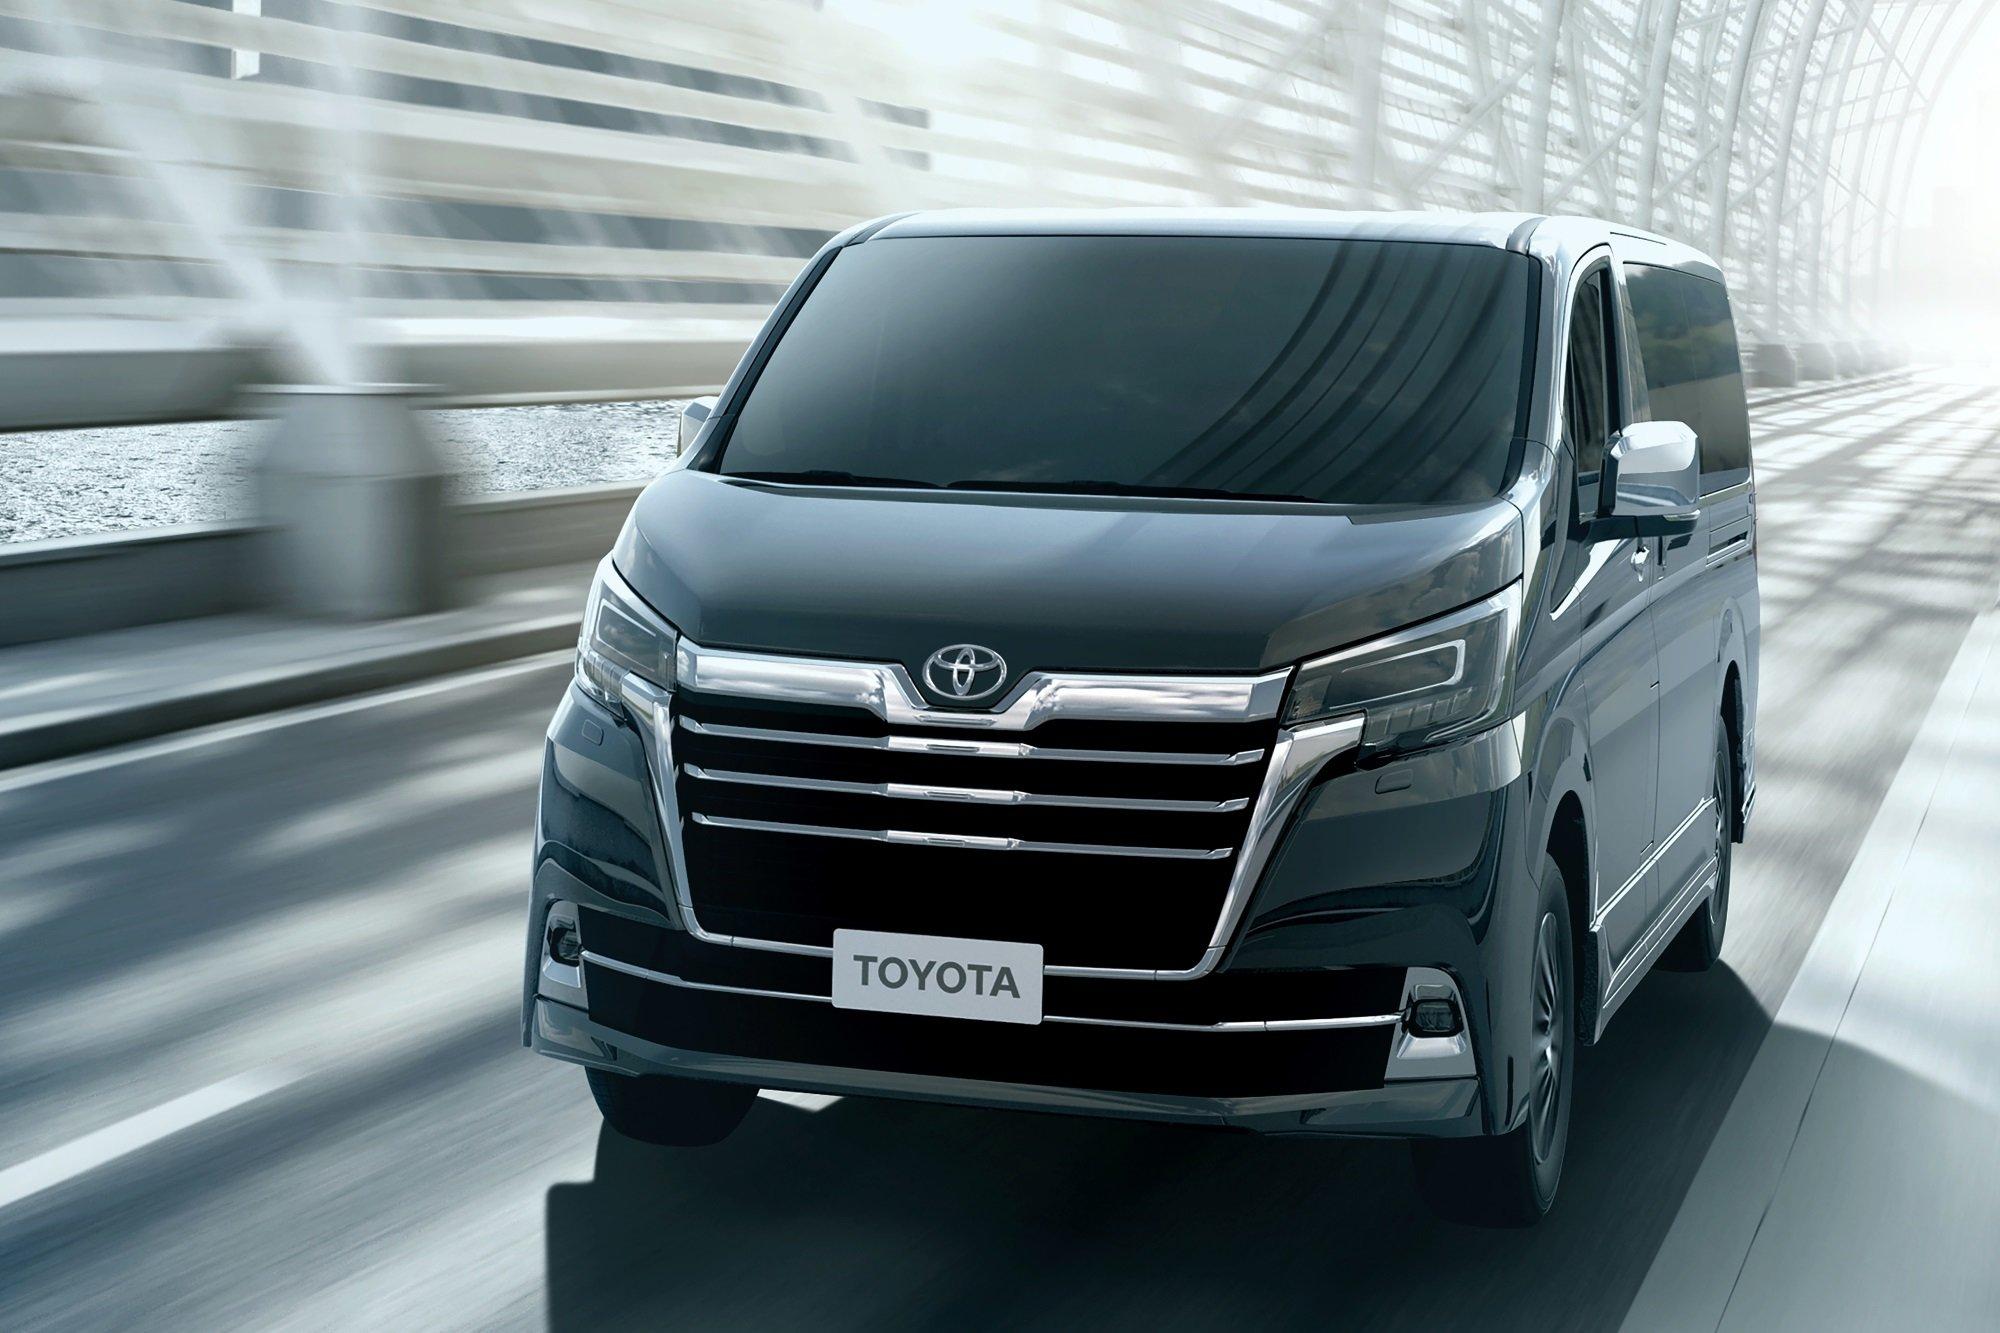 Новый микроавтобус Toyota Granvia 2020 (фото, цена, характеристики)